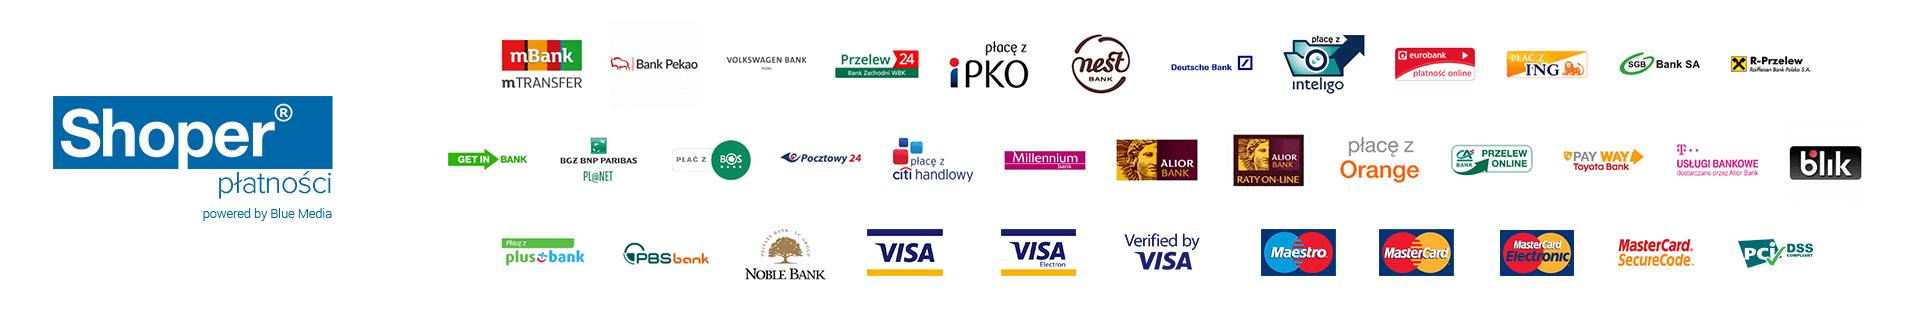 https://dcsaascdn.net/shoperpl/payments/platnosci-poziom-z-kartami-white.png